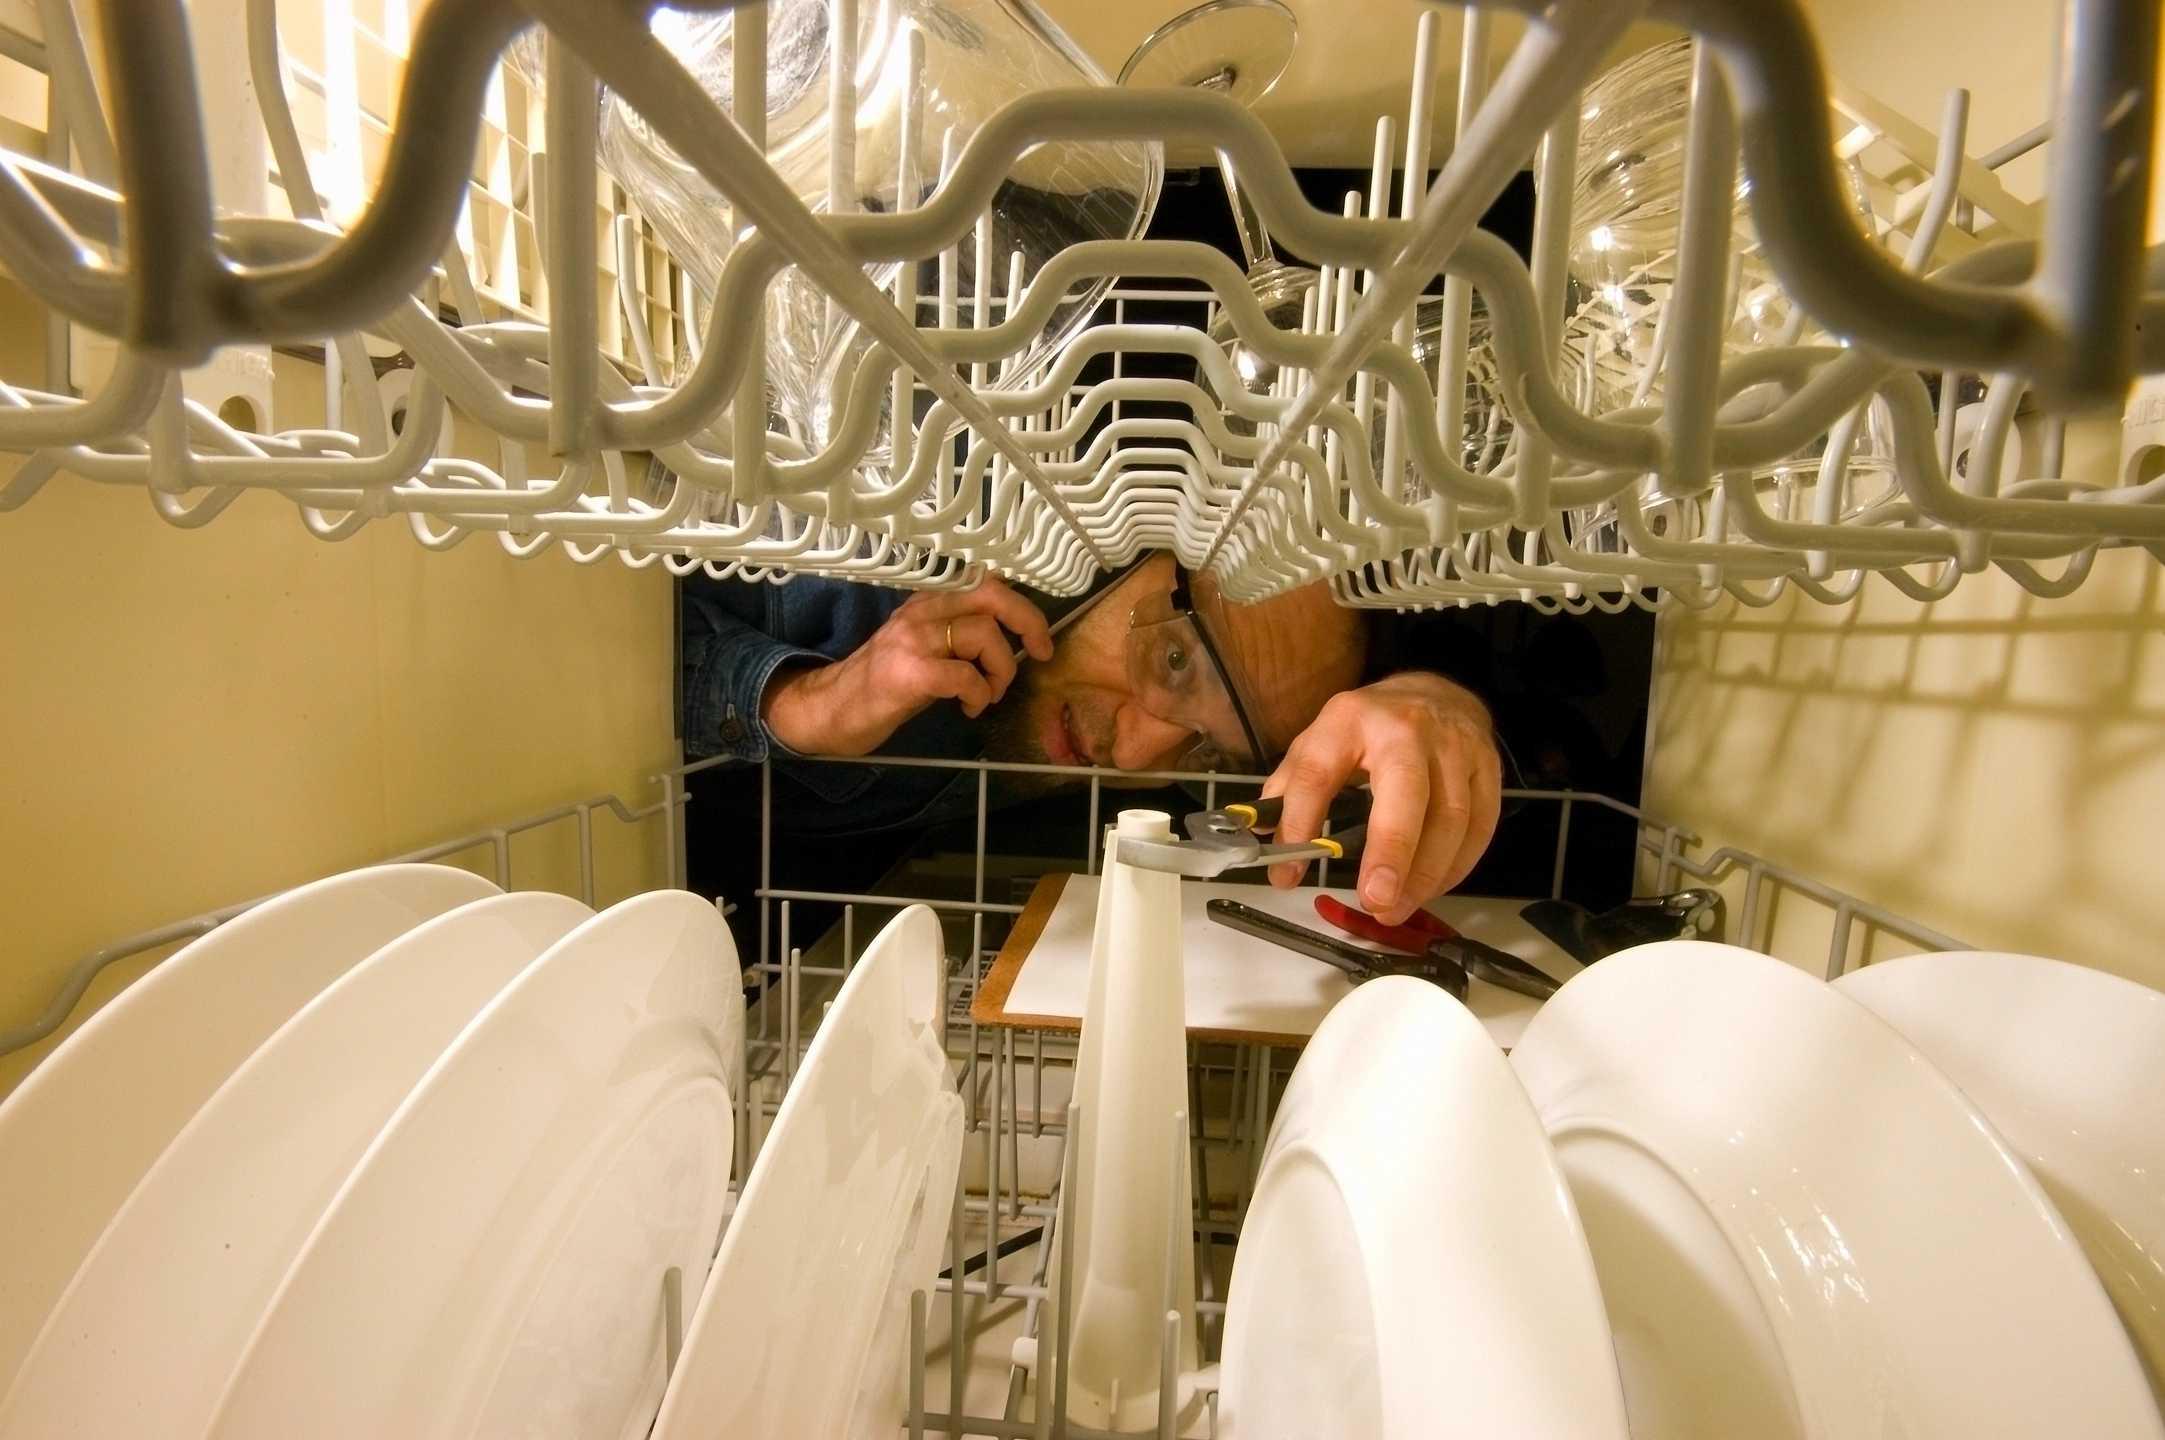 Ge Appliance Repair Kansas City Raders Appliance Repair Factory Authorized Service For Kansas City